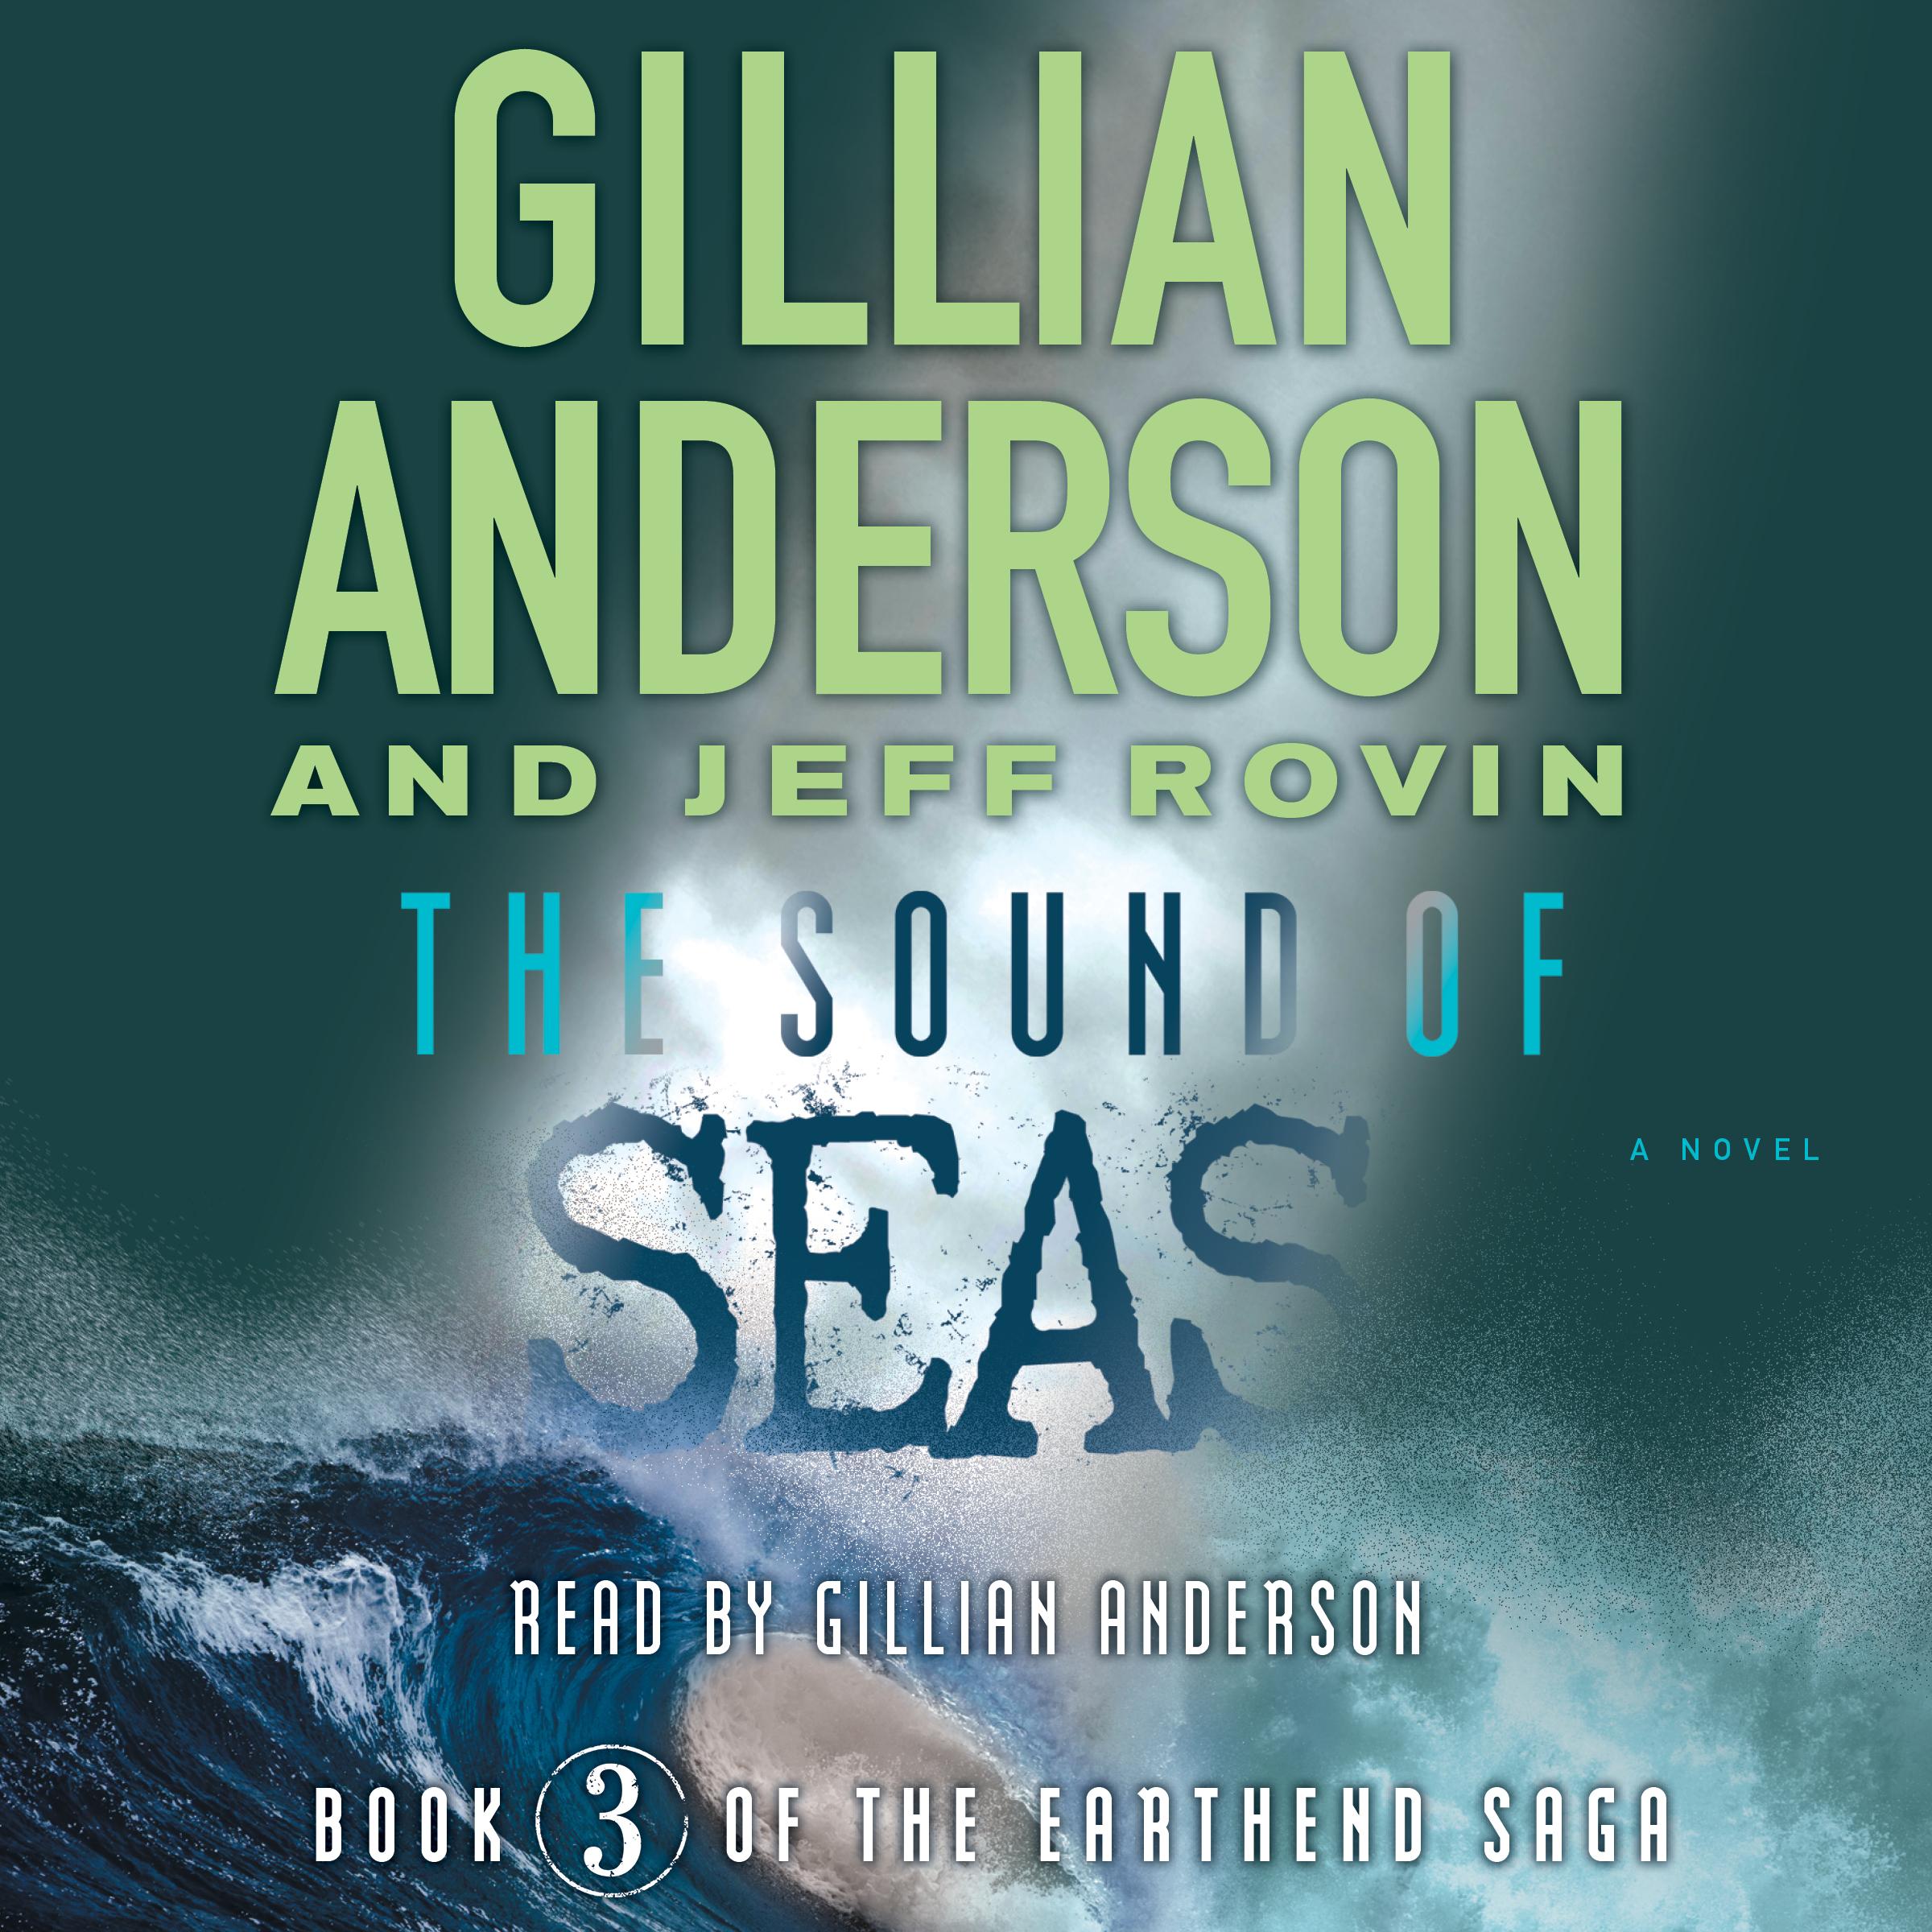 The sound of seas 9781508229933 hr